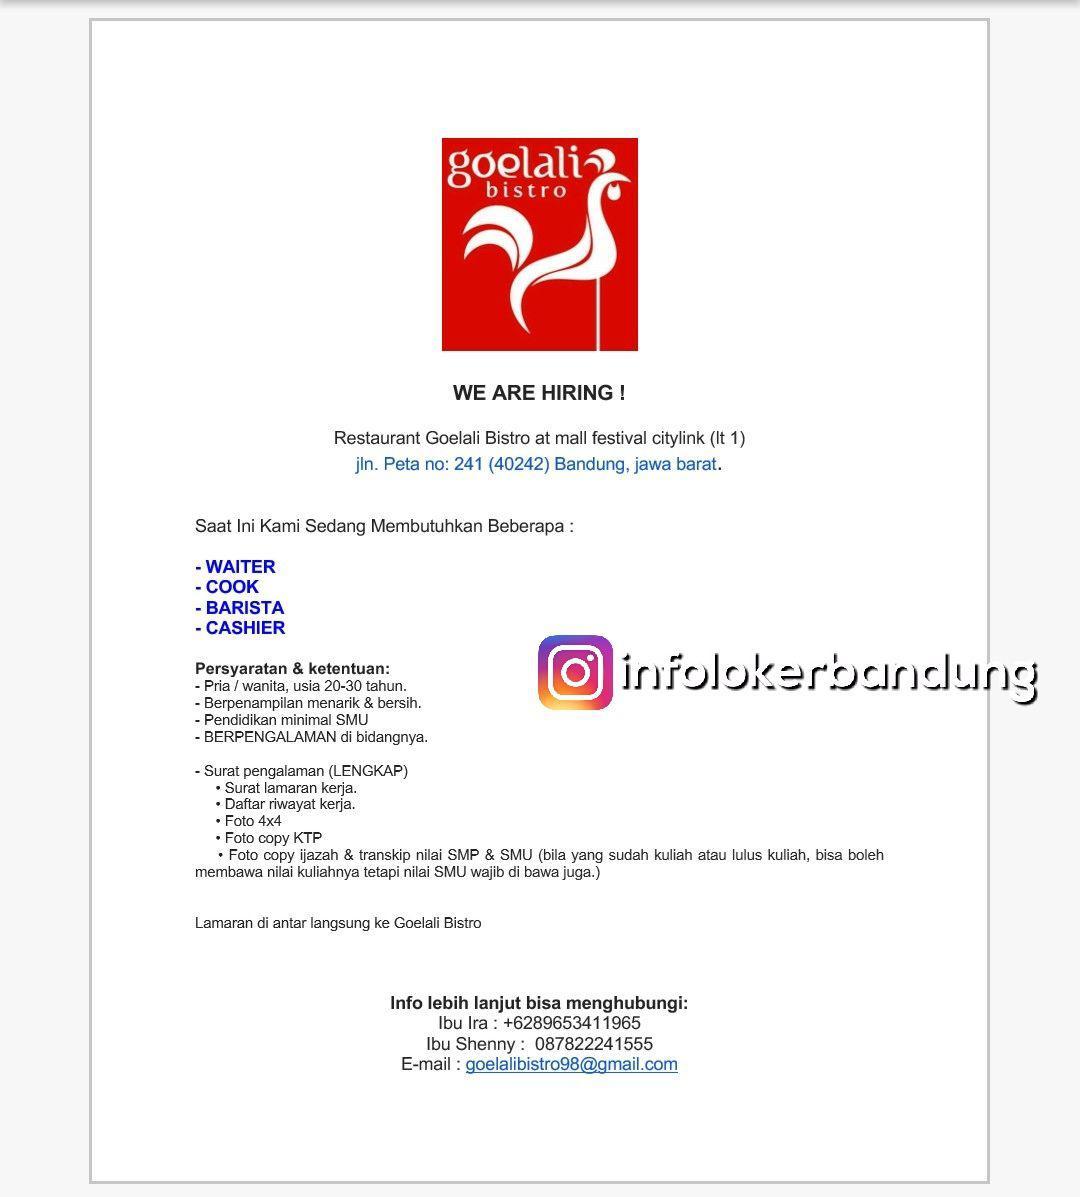 Lowongan Kerja Restaurant Goelali Bistro Bandung Desember 2017